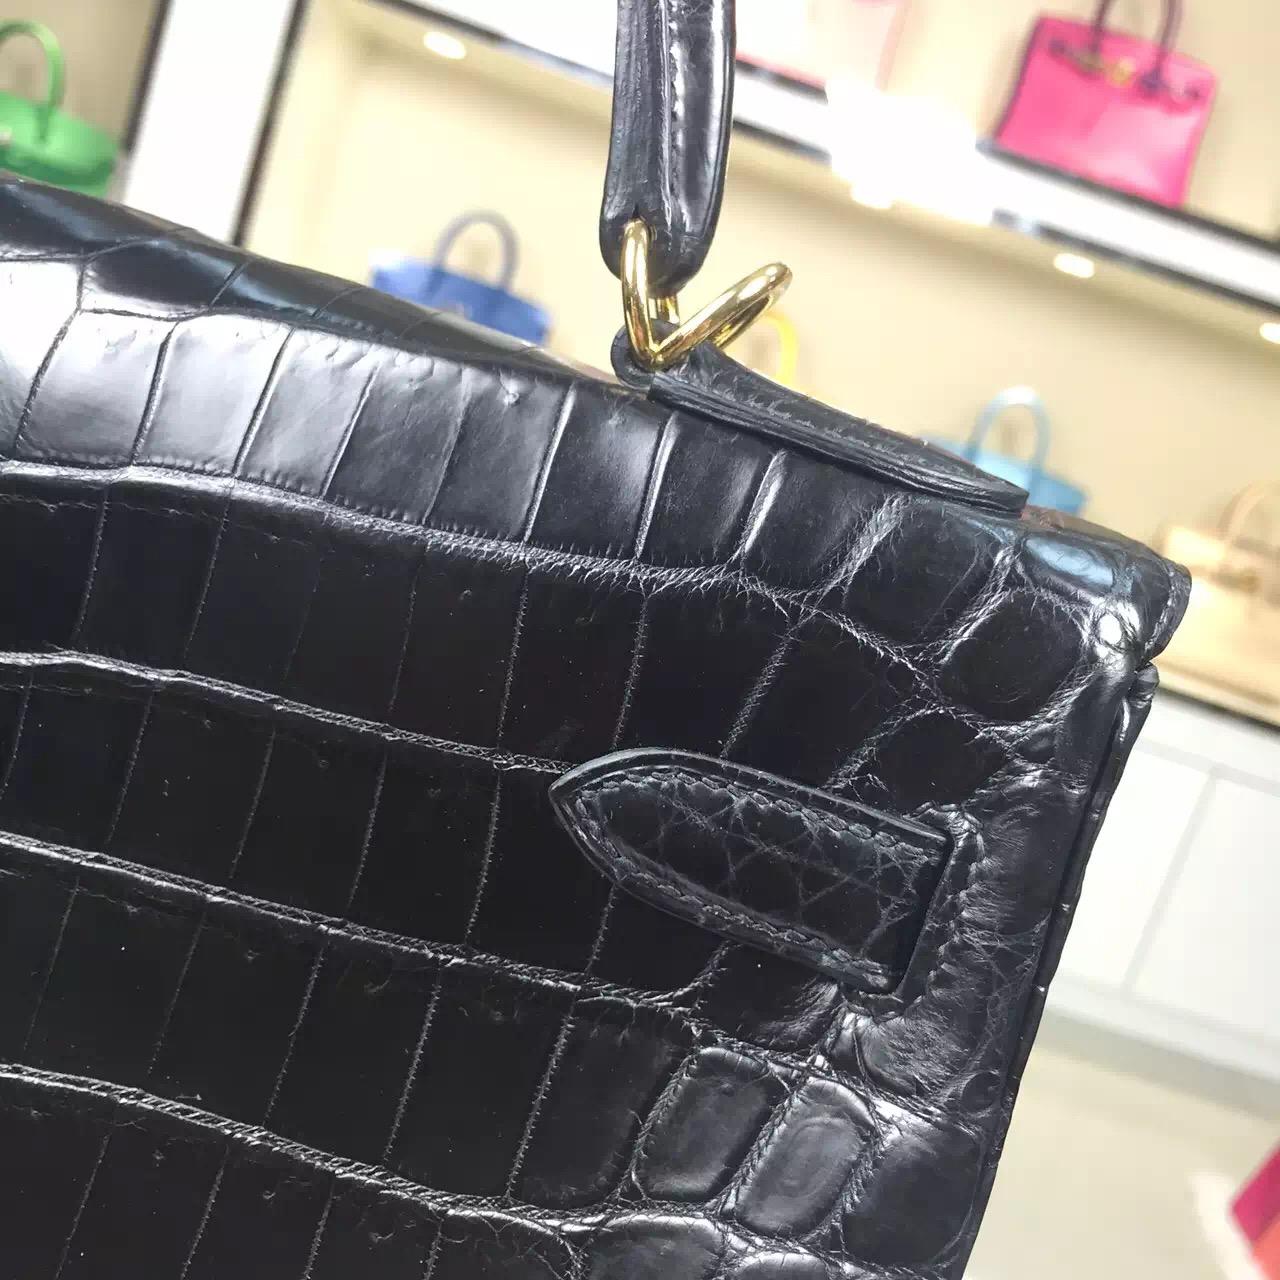 Hot Sale Hermes Kelly Bag 32CM CK89 Black Crocodile Skin Leather Women's Handbag